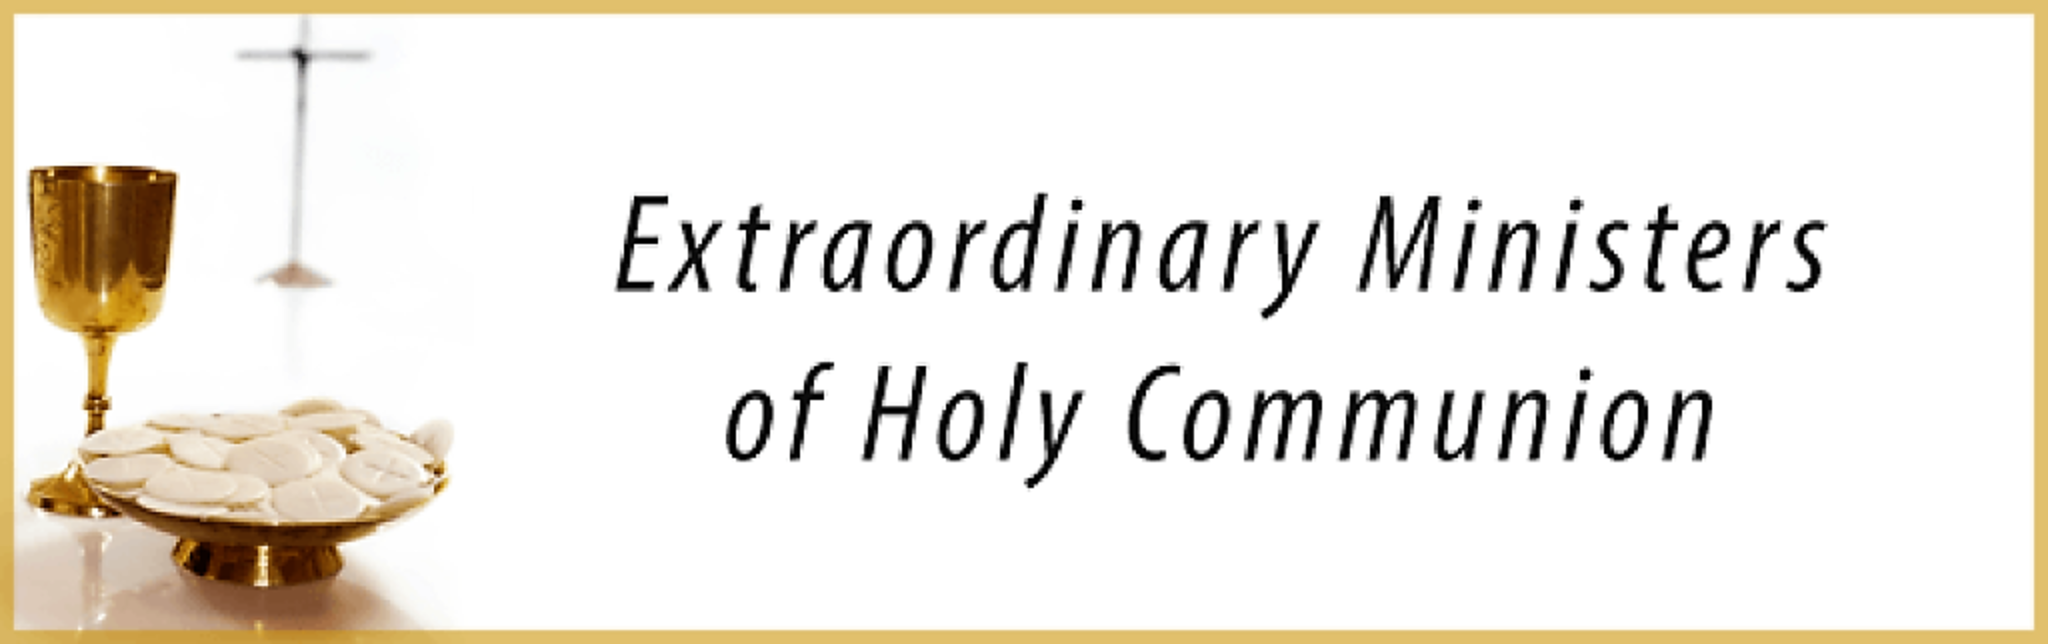 Extraordinary Ministers